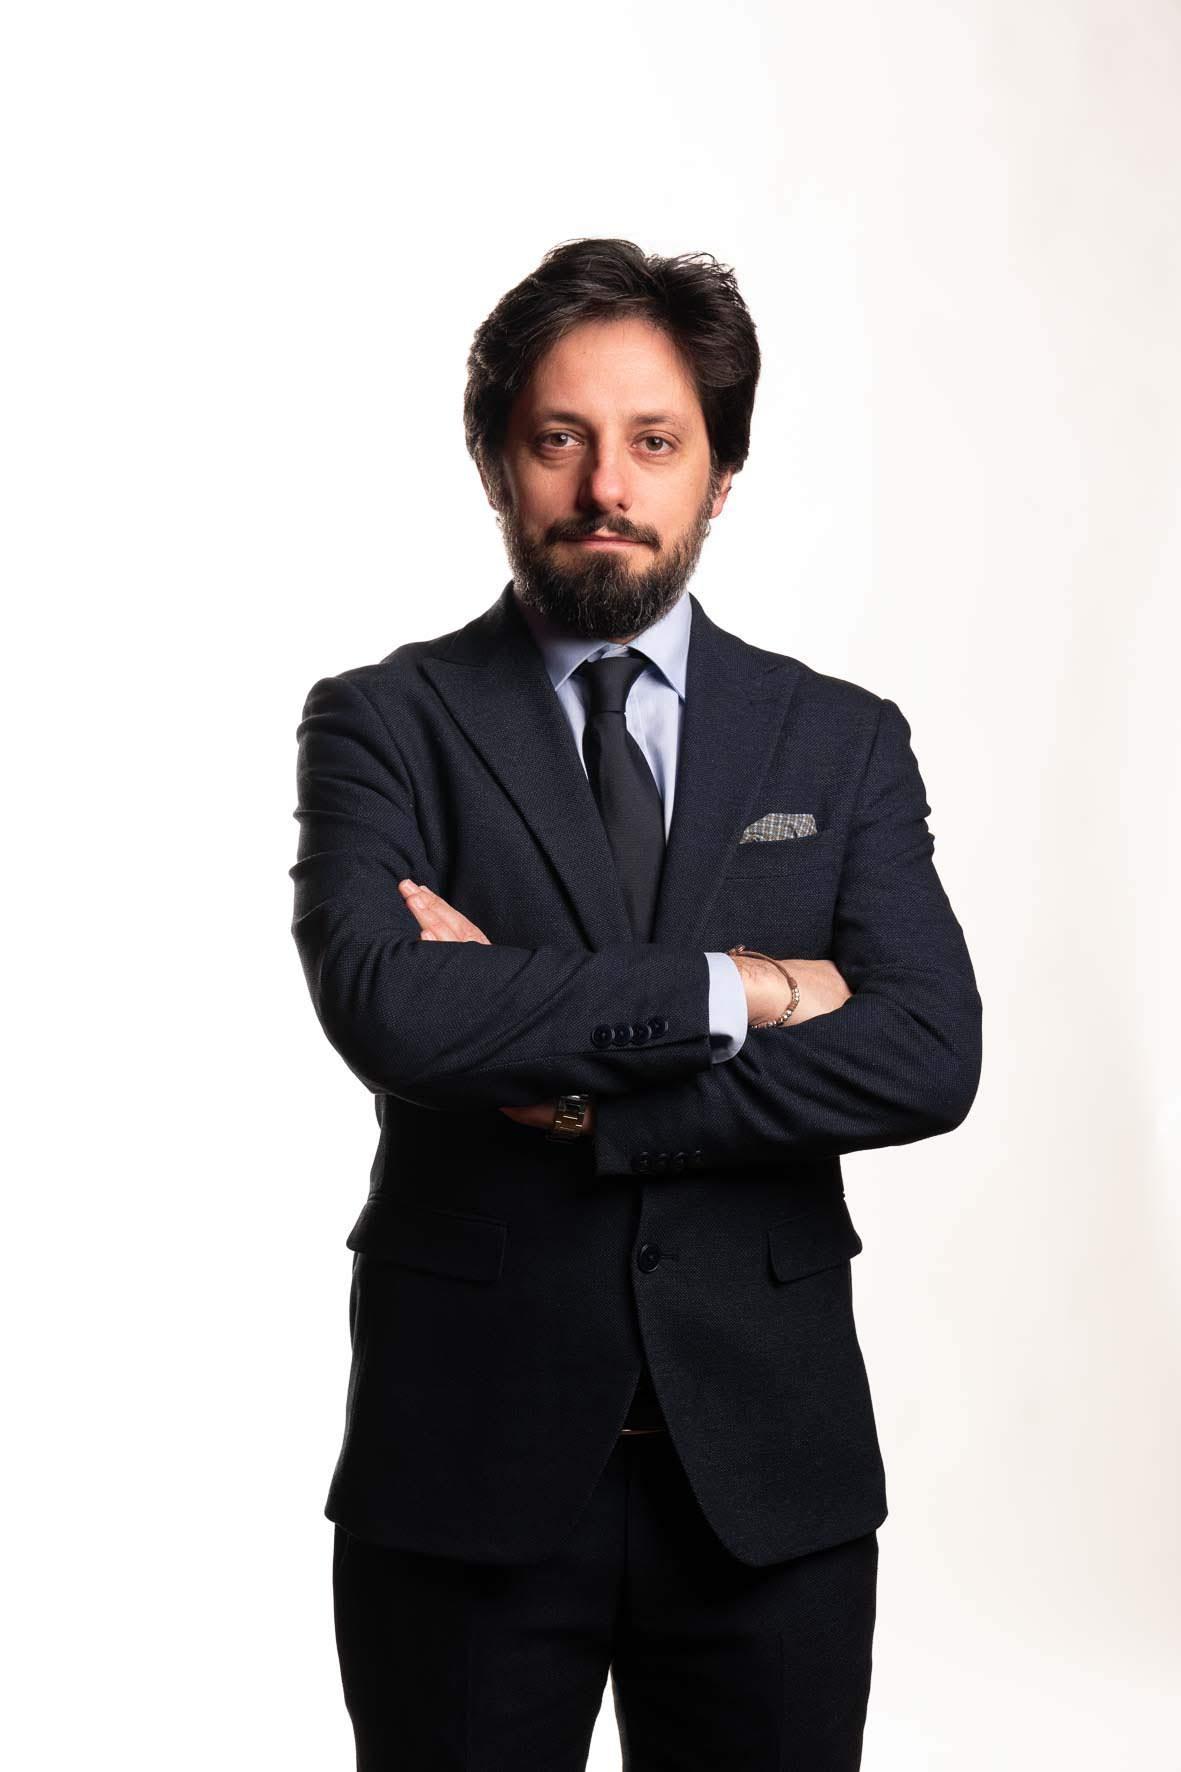 relatori Creare eCommerce: Antonino Polimeni